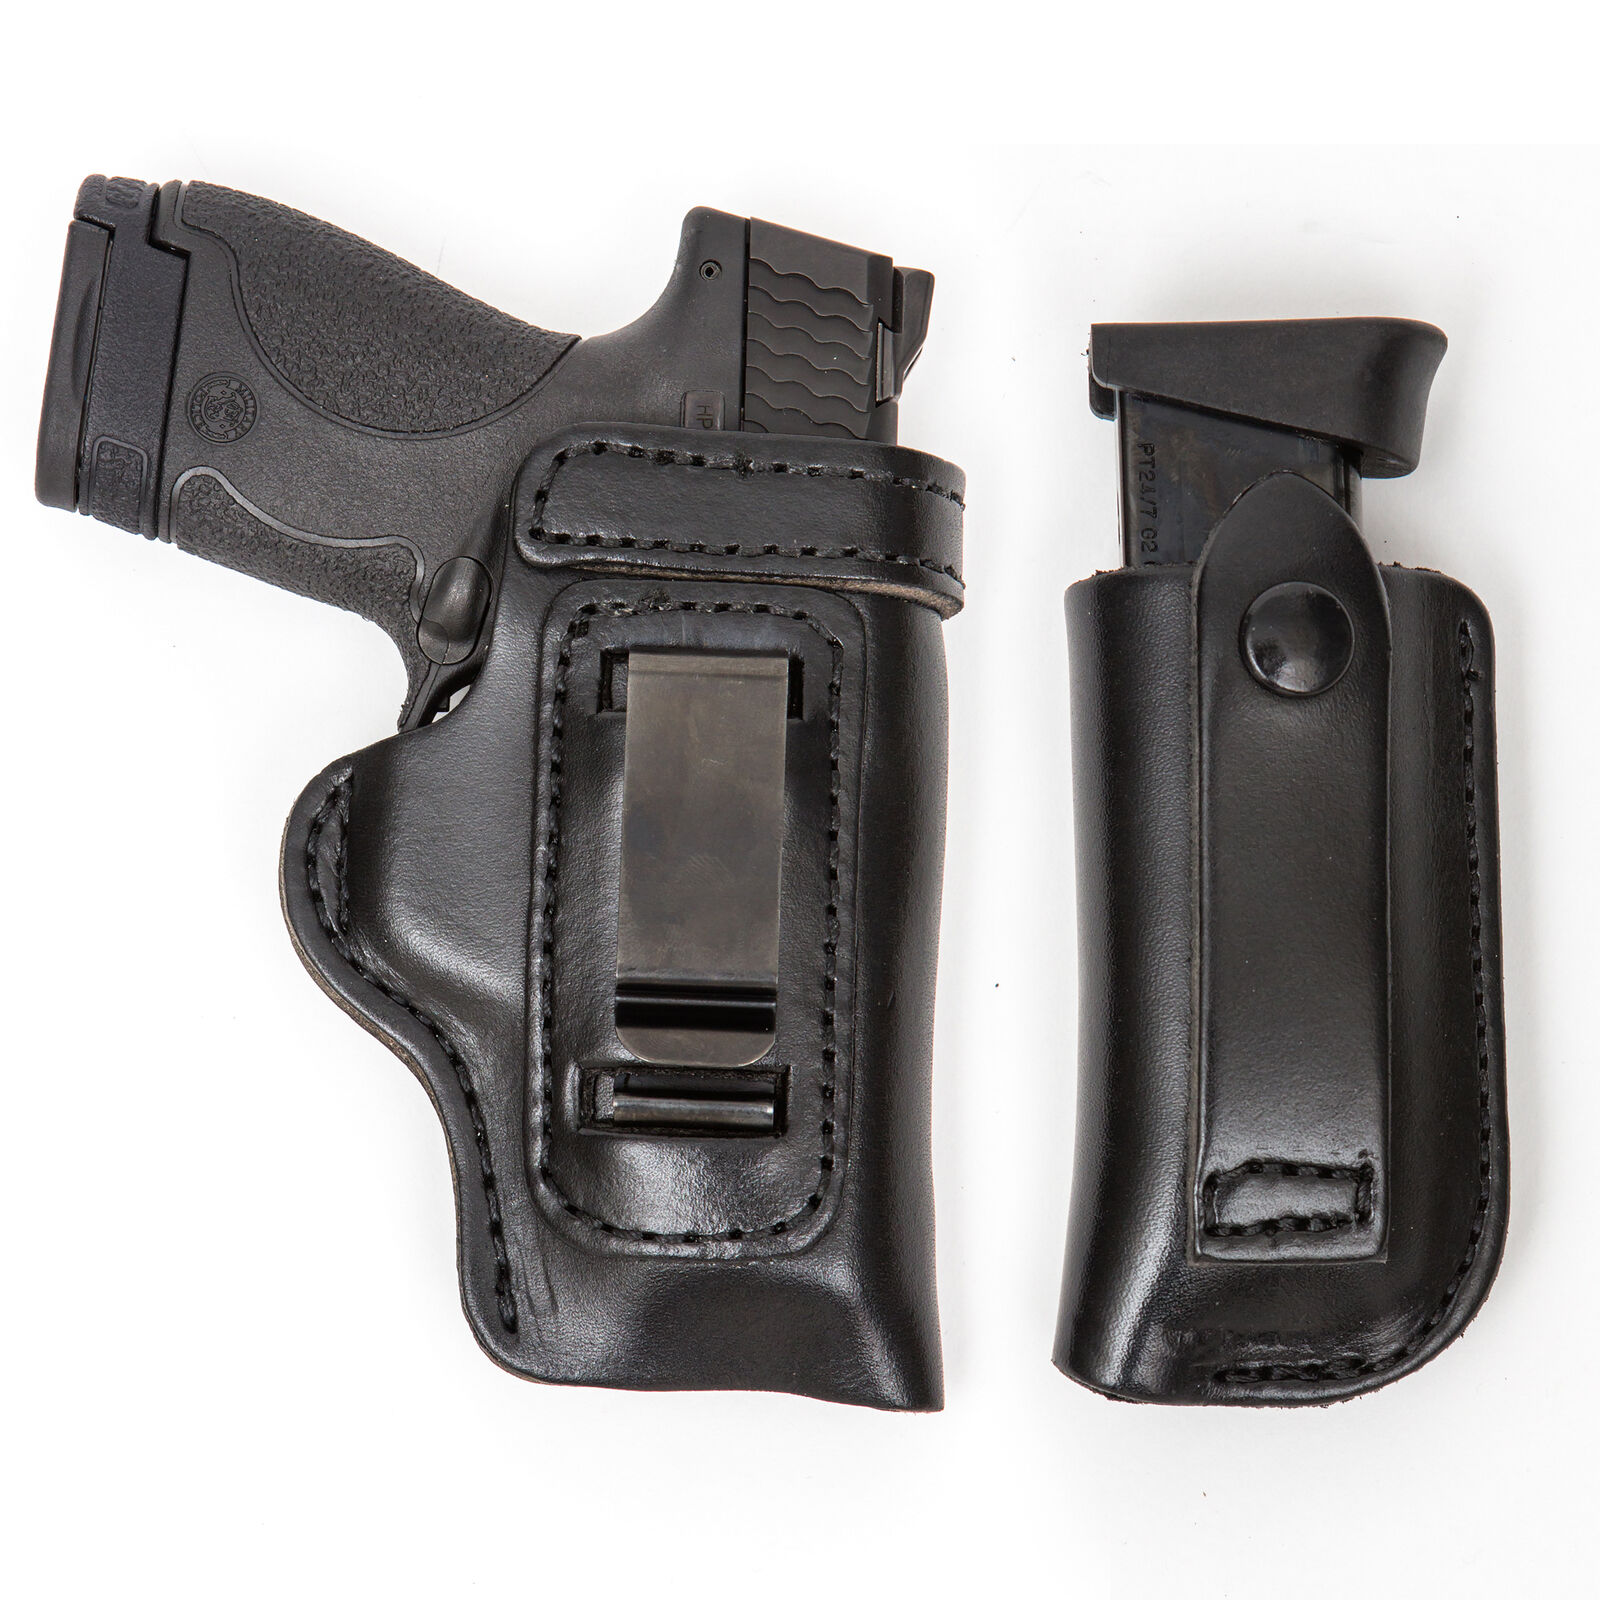 Combo Pack IWB owb RH LH Funda Pistola & Mag Para FN 5.7 cinco siete